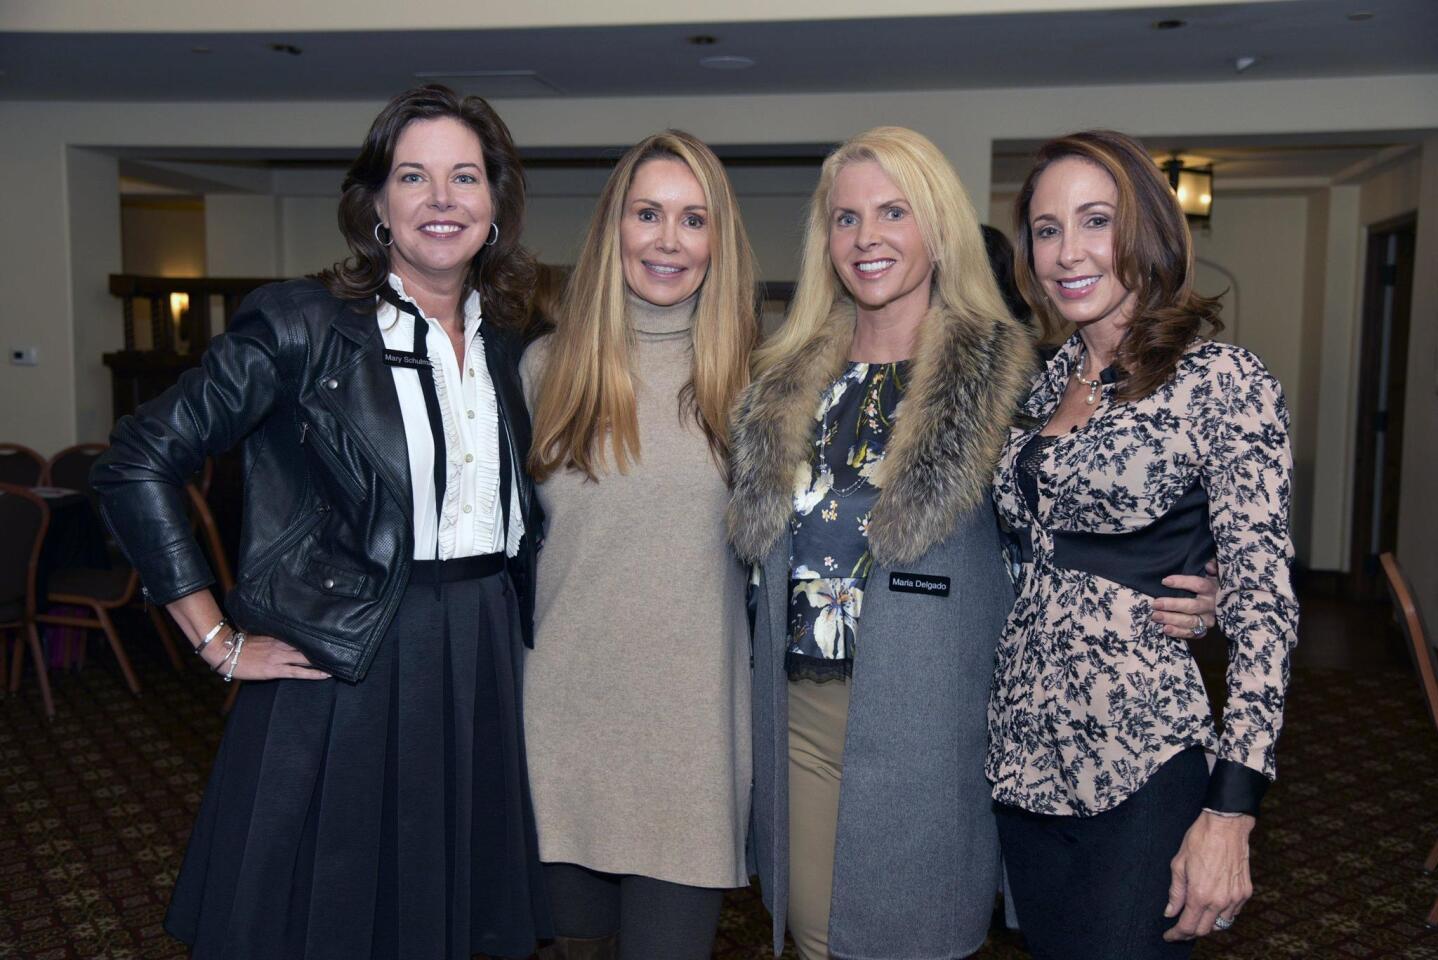 Mary Schulman, Robin Hudgens, Incoming Grant Co-Chairs Maria Delgado and Tamara La Farga-Joseph